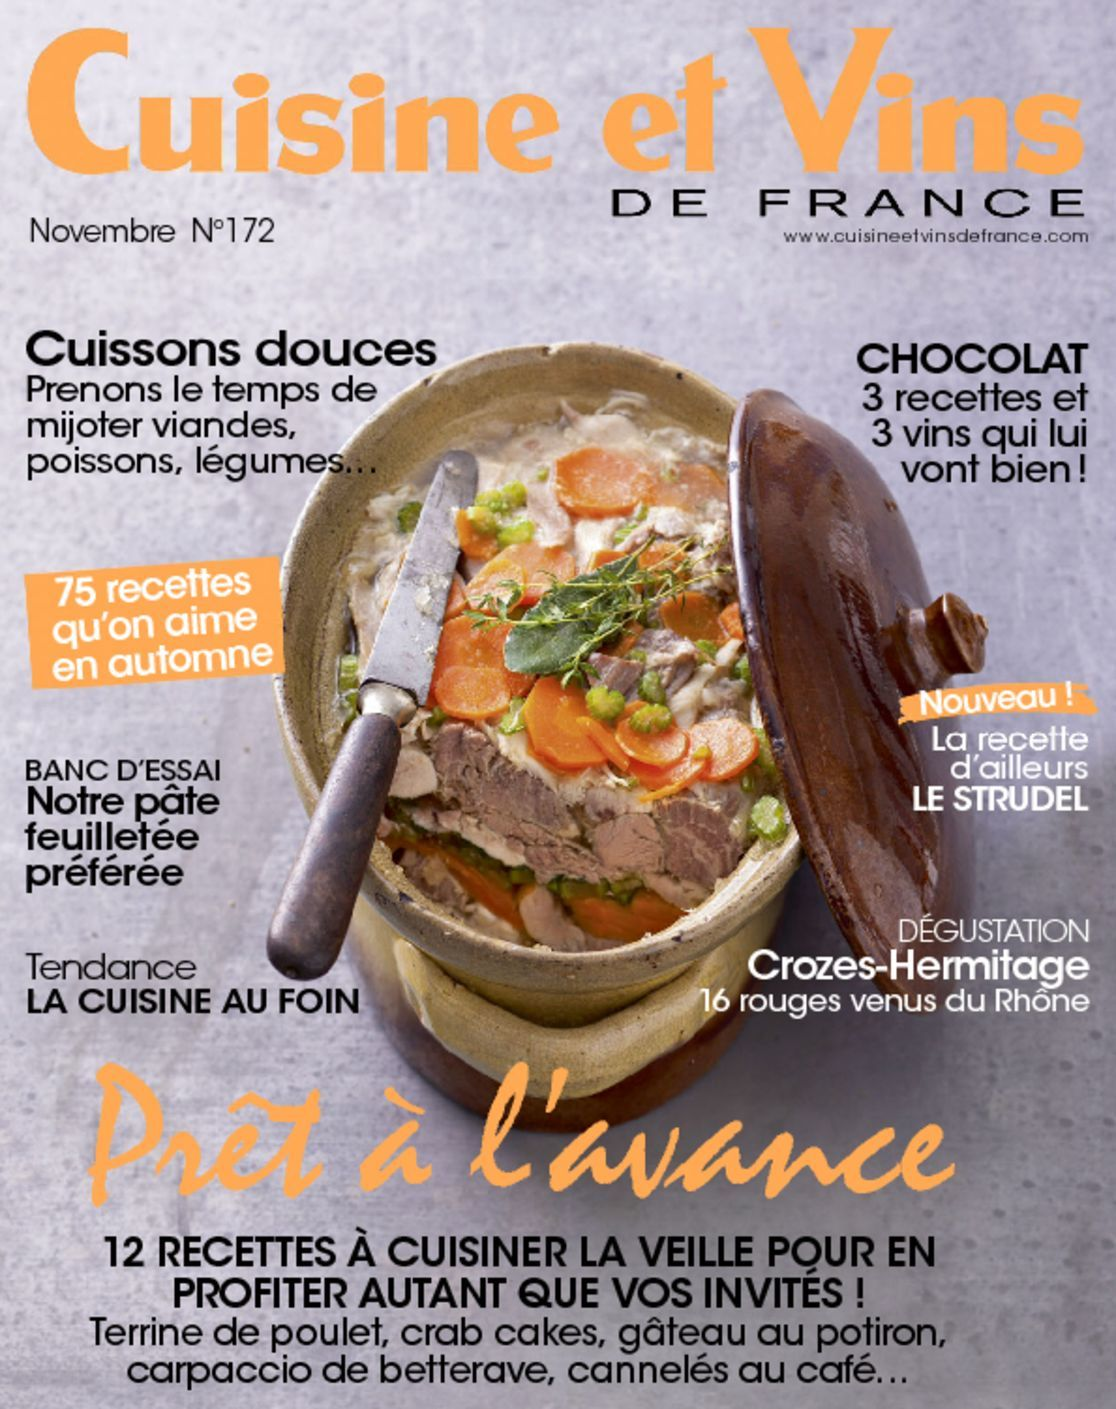 Cuisine et vins de france digital magazine for Abonnement cuisine et vins de france